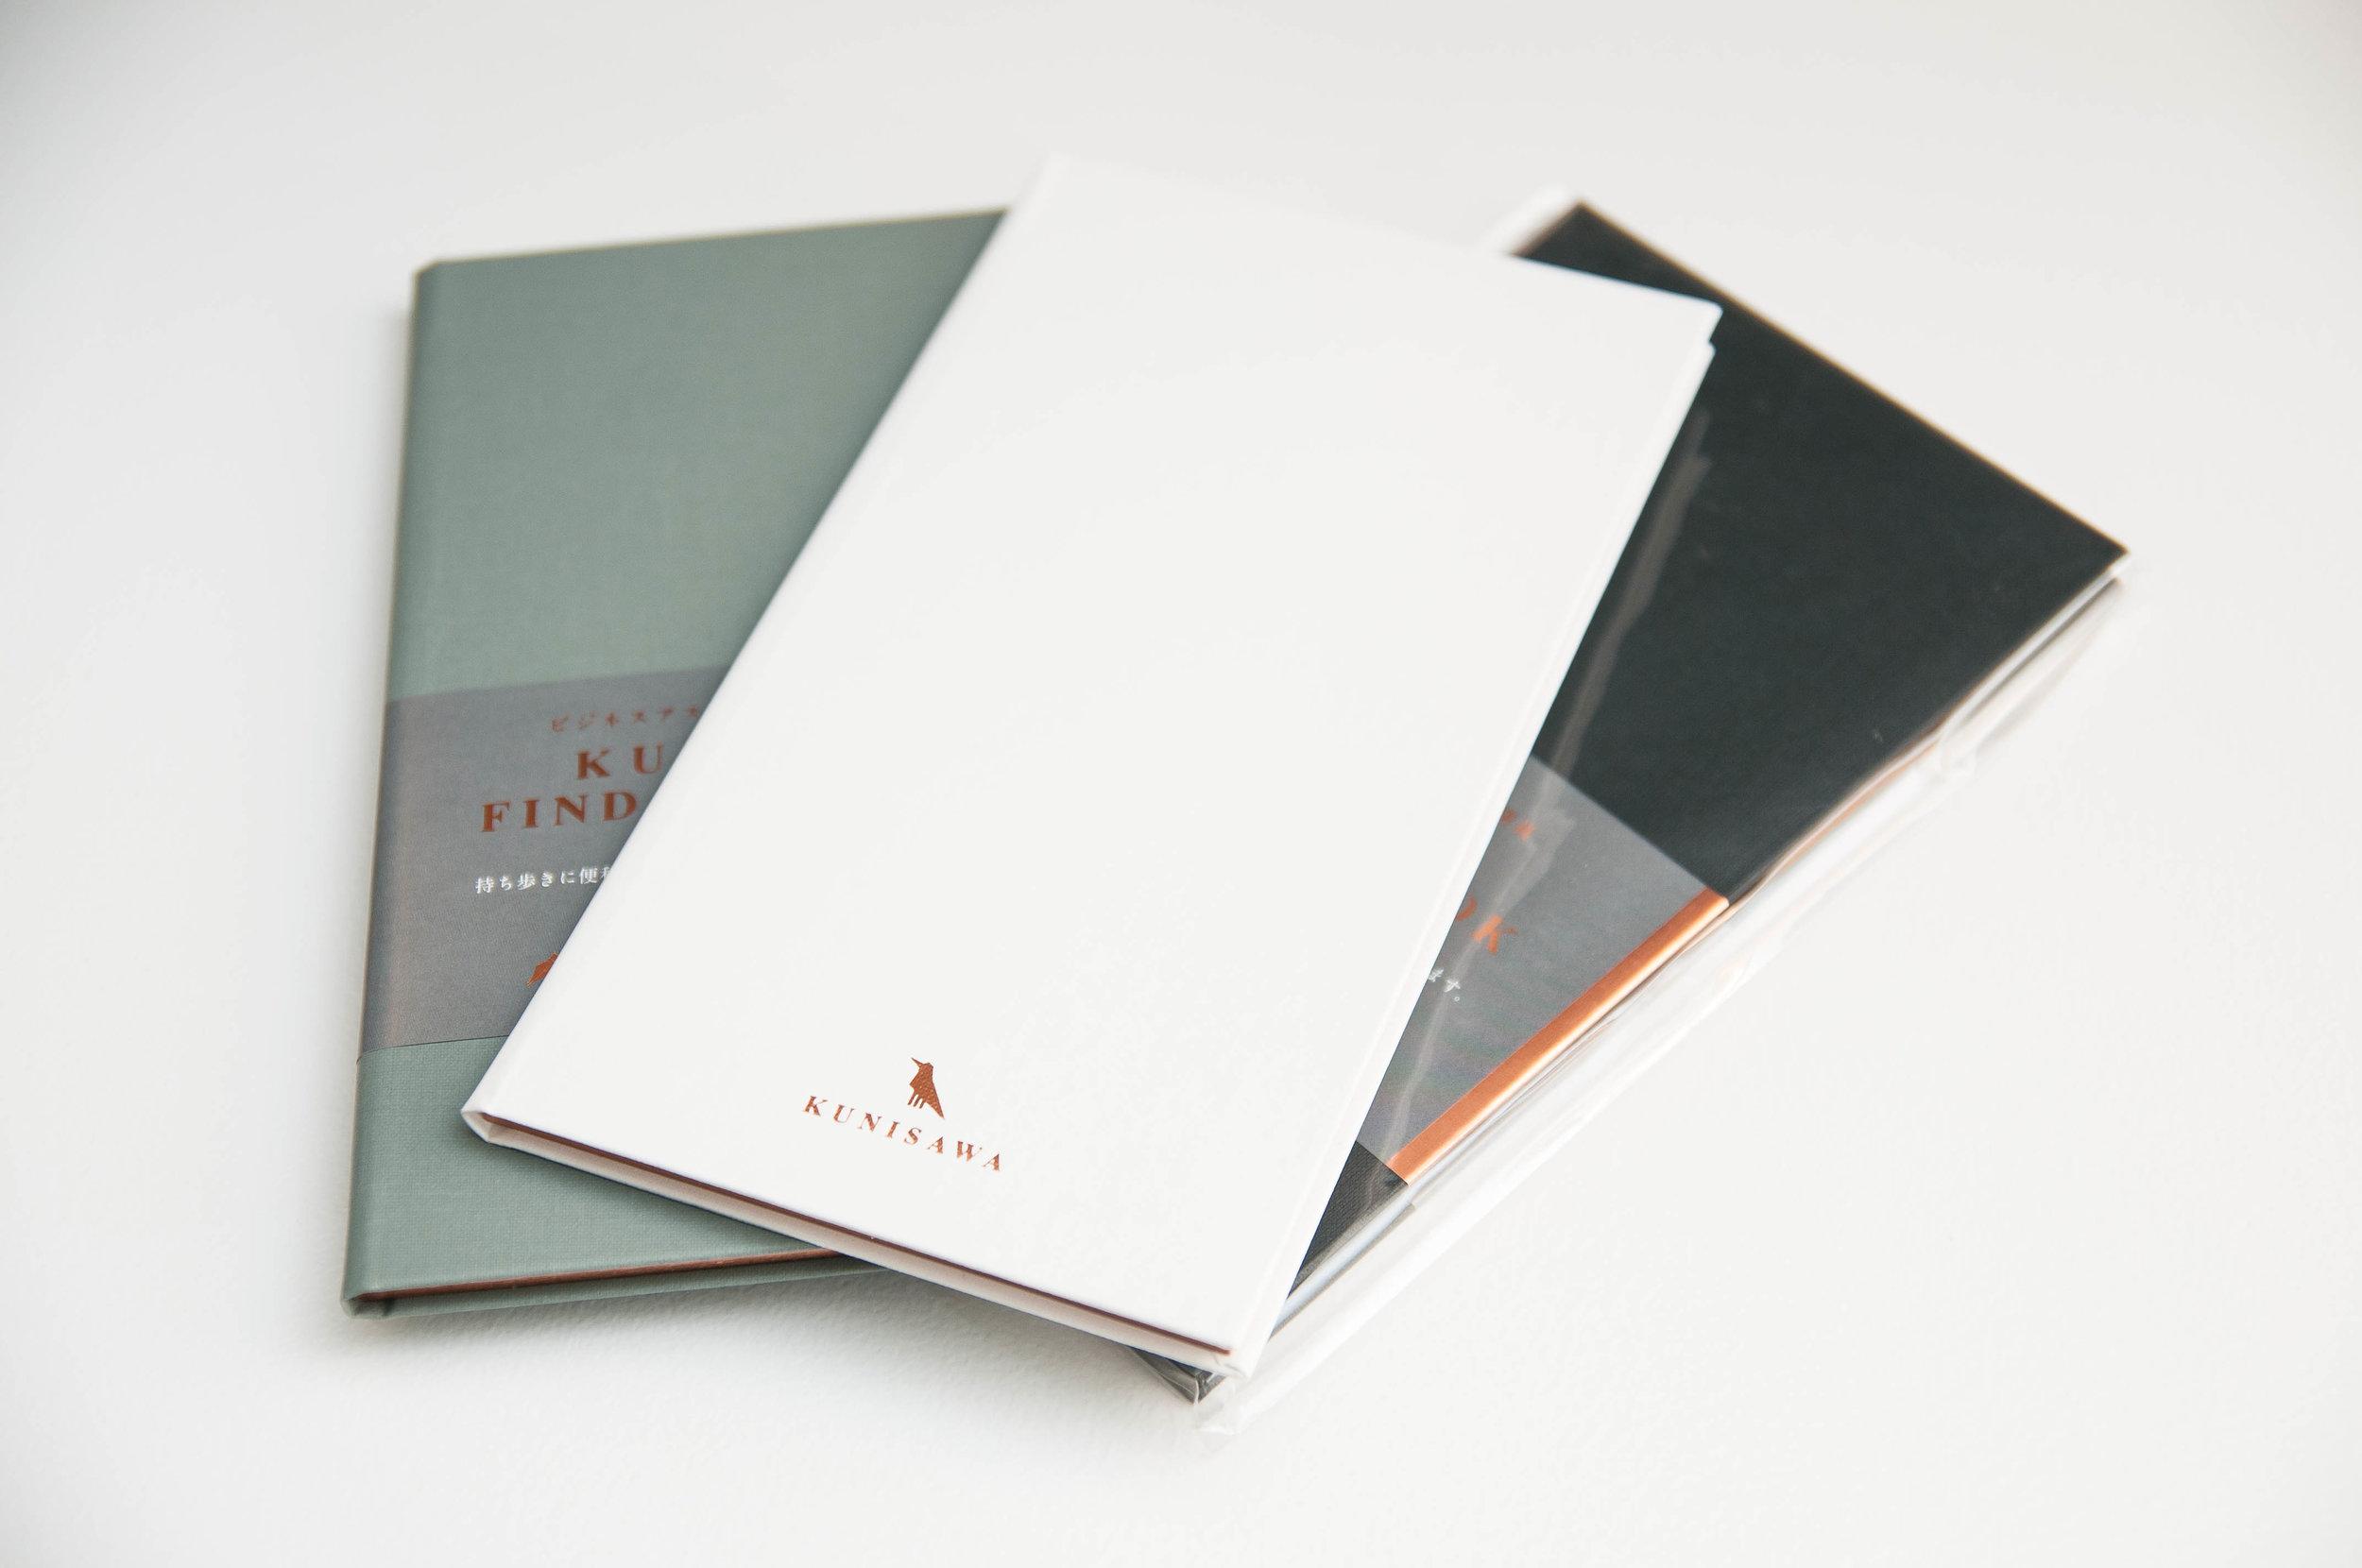 Kunisawa Find Smart Notebook Review